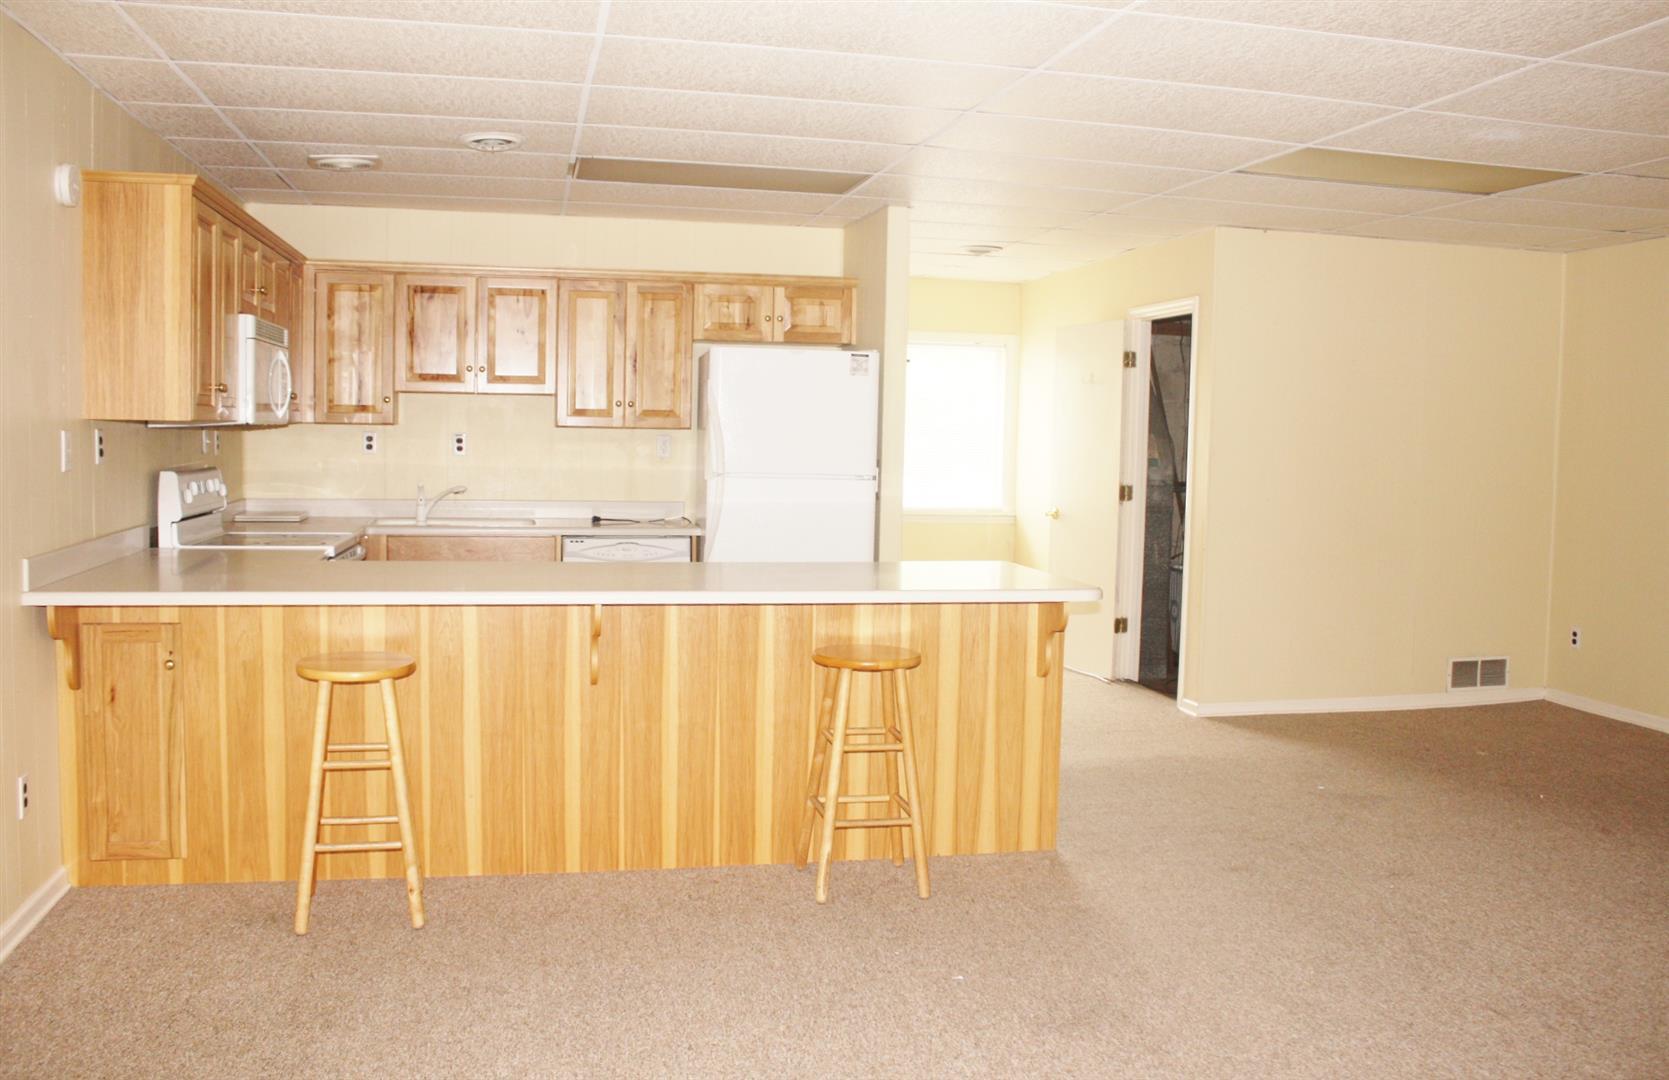 For Rent: 14 1/2 W Washington St-Available July 1st  Lexington VA, 24450